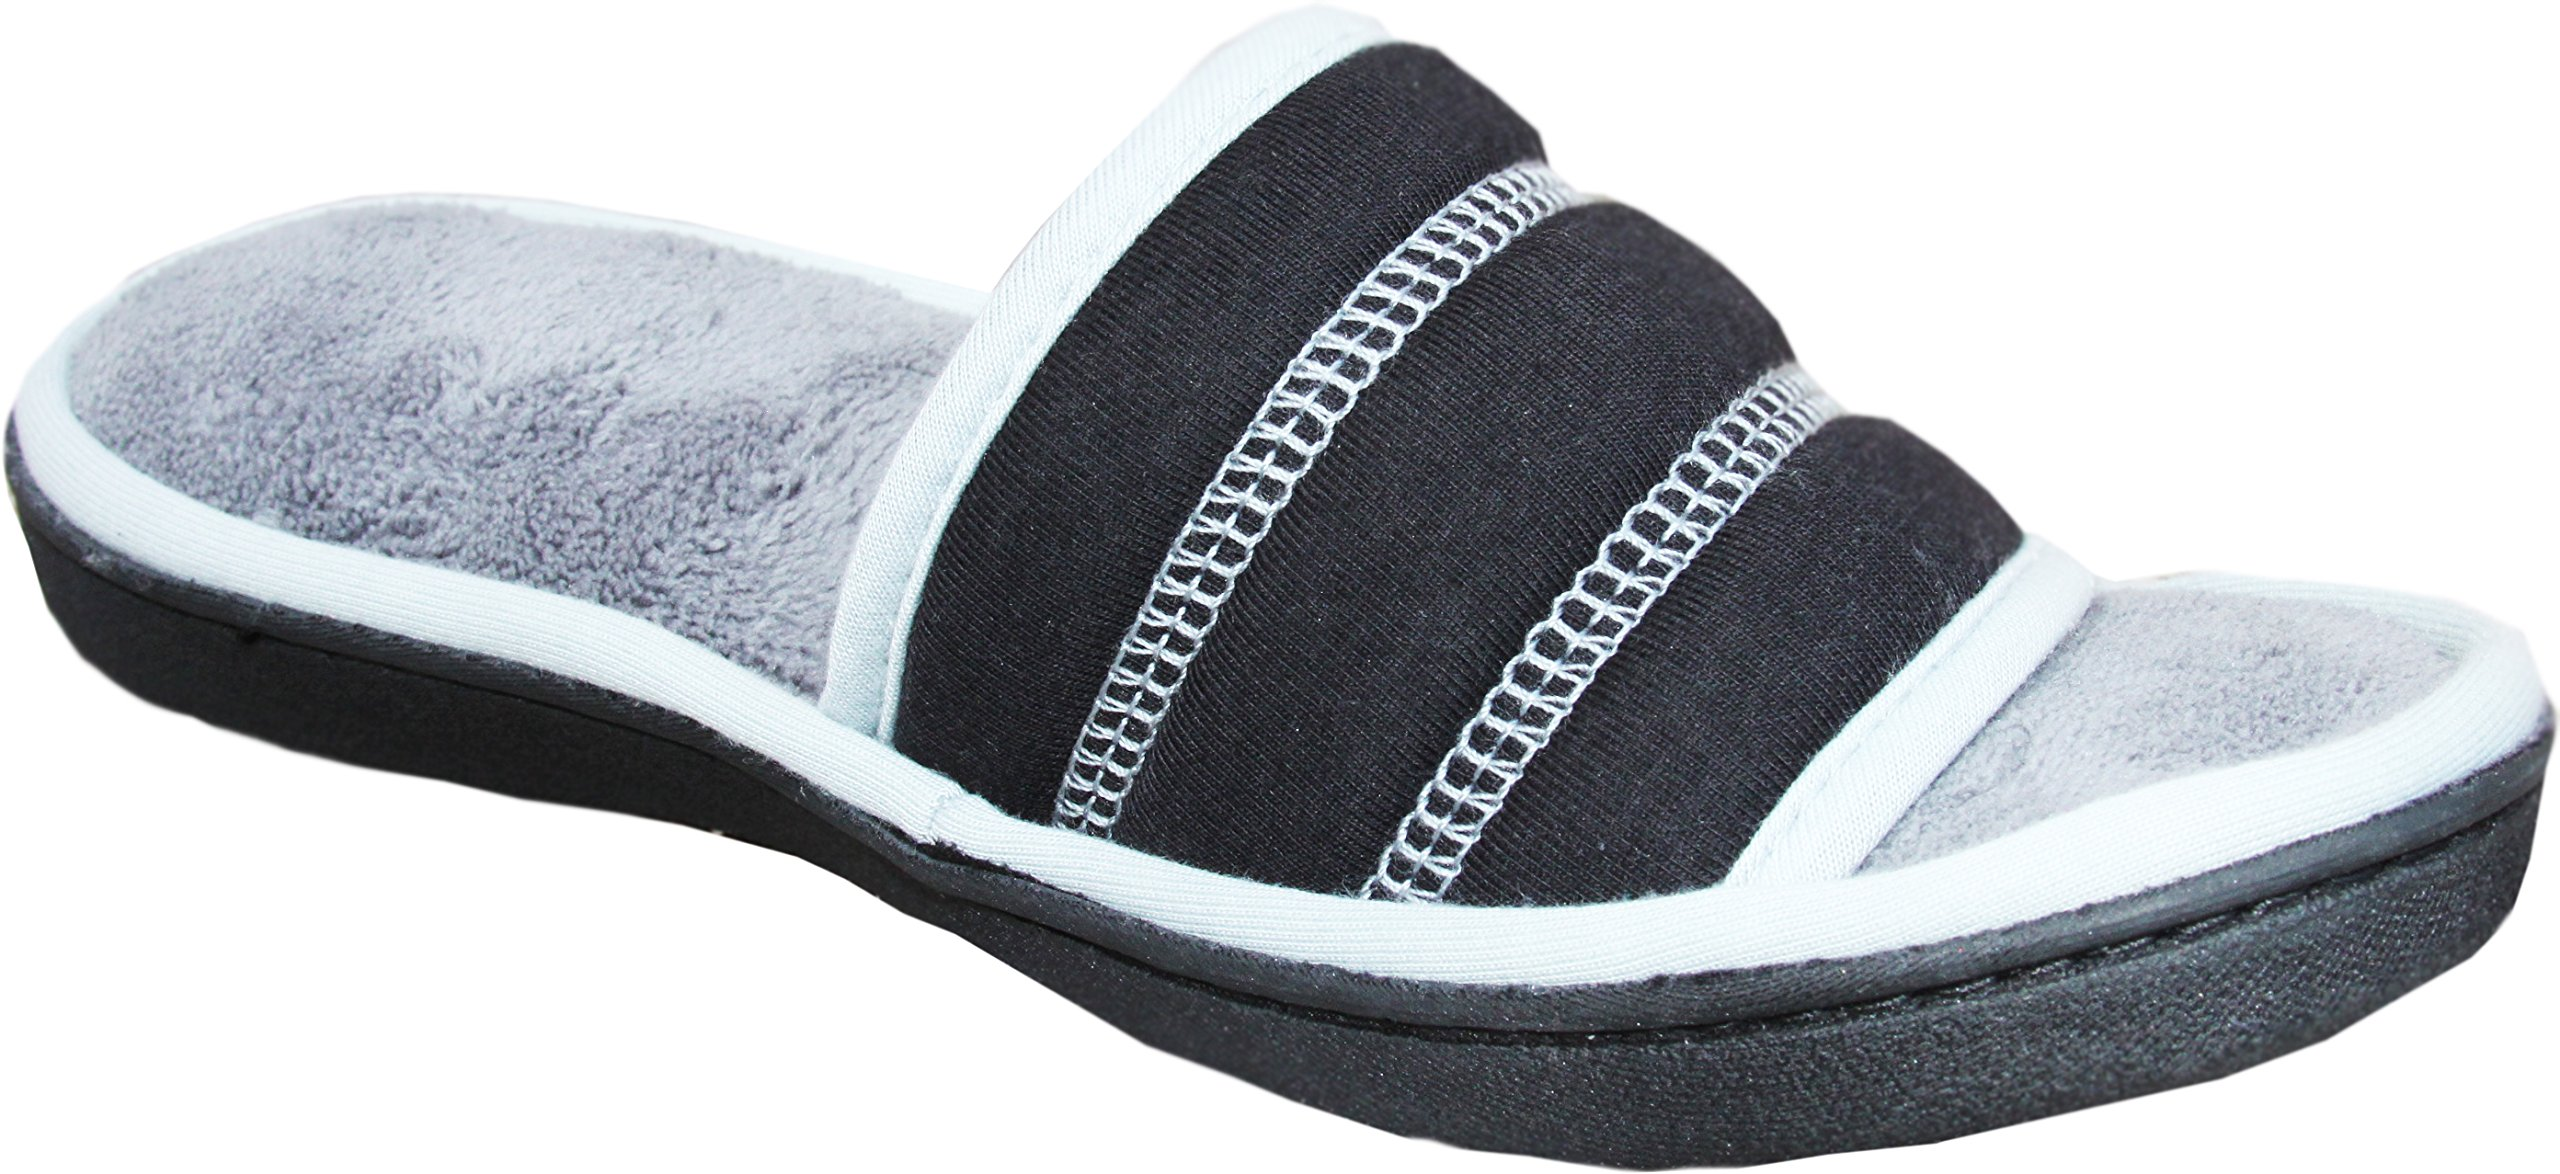 ISOTONER Women's Microterry Jersey Selena Slide Slipper (8.5-9.0, Black)